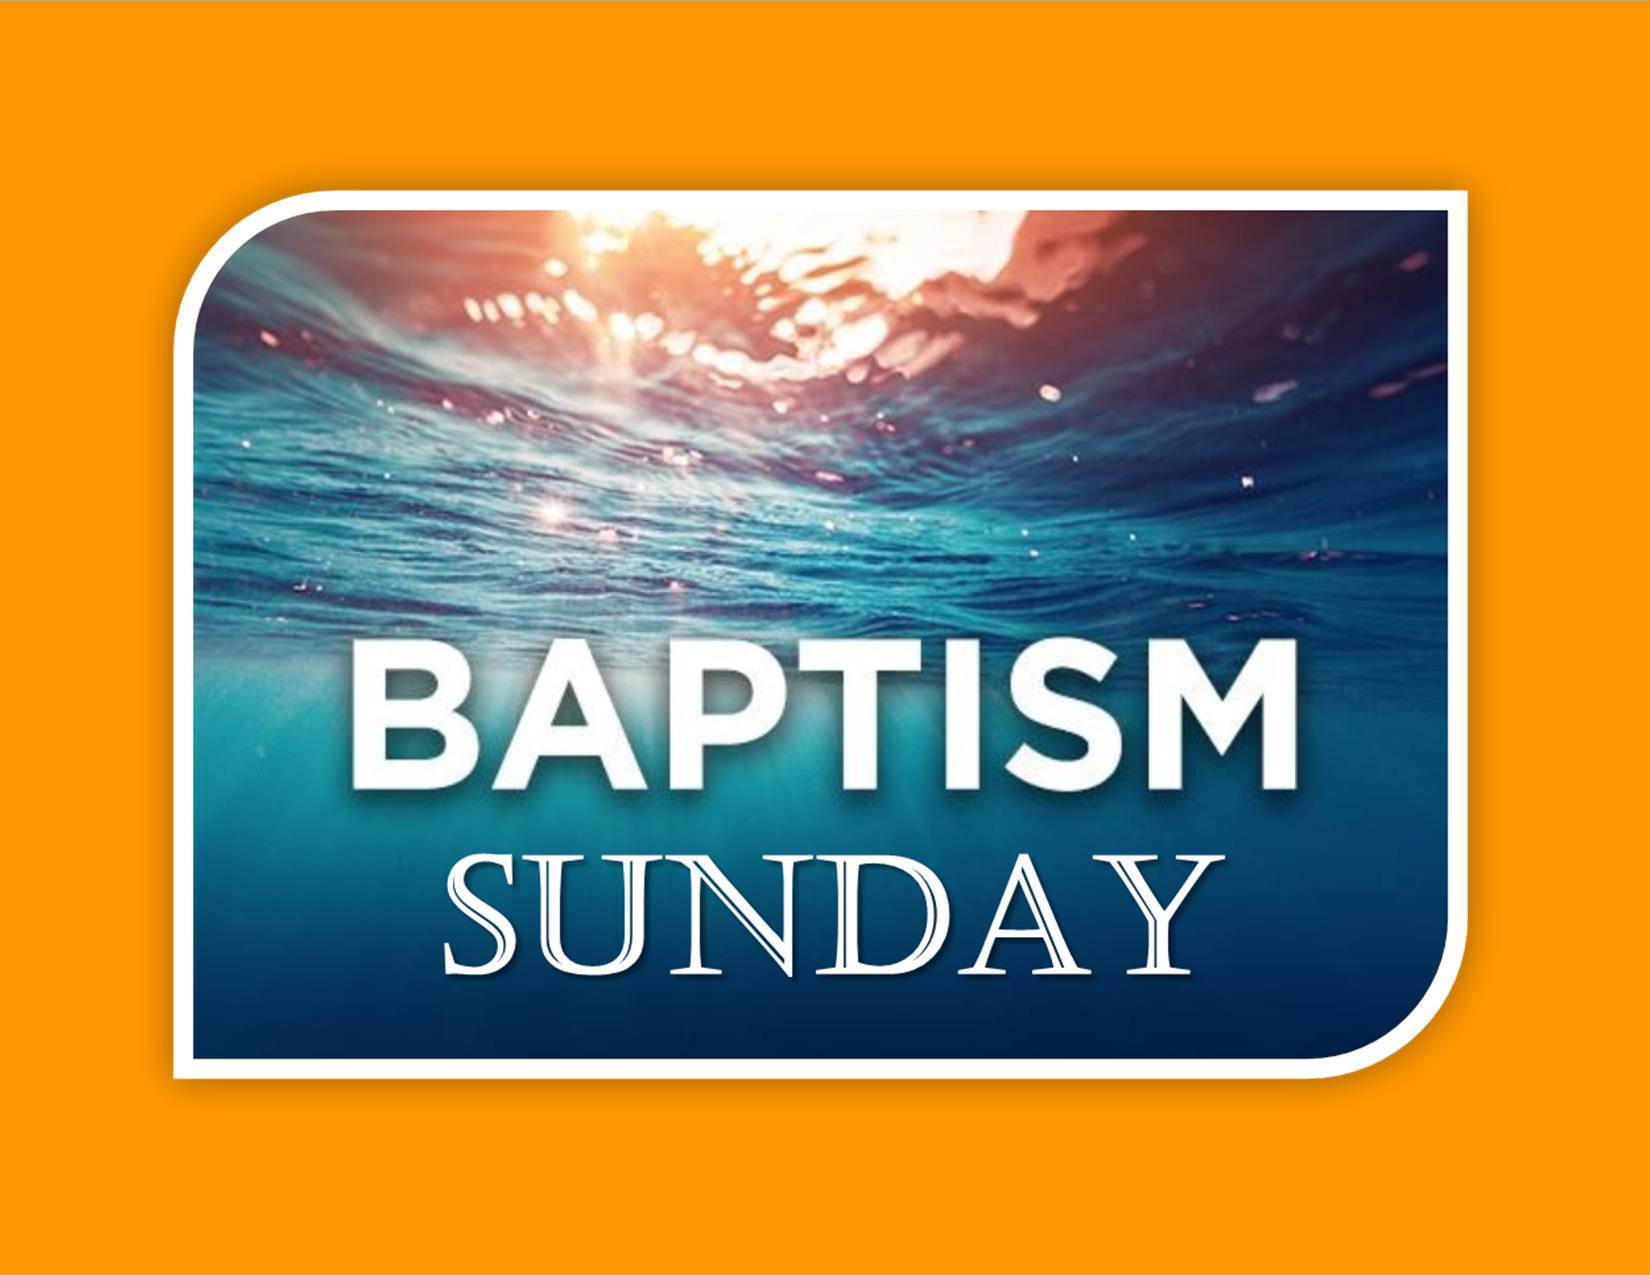 BAPTISM PIC 2.jpg